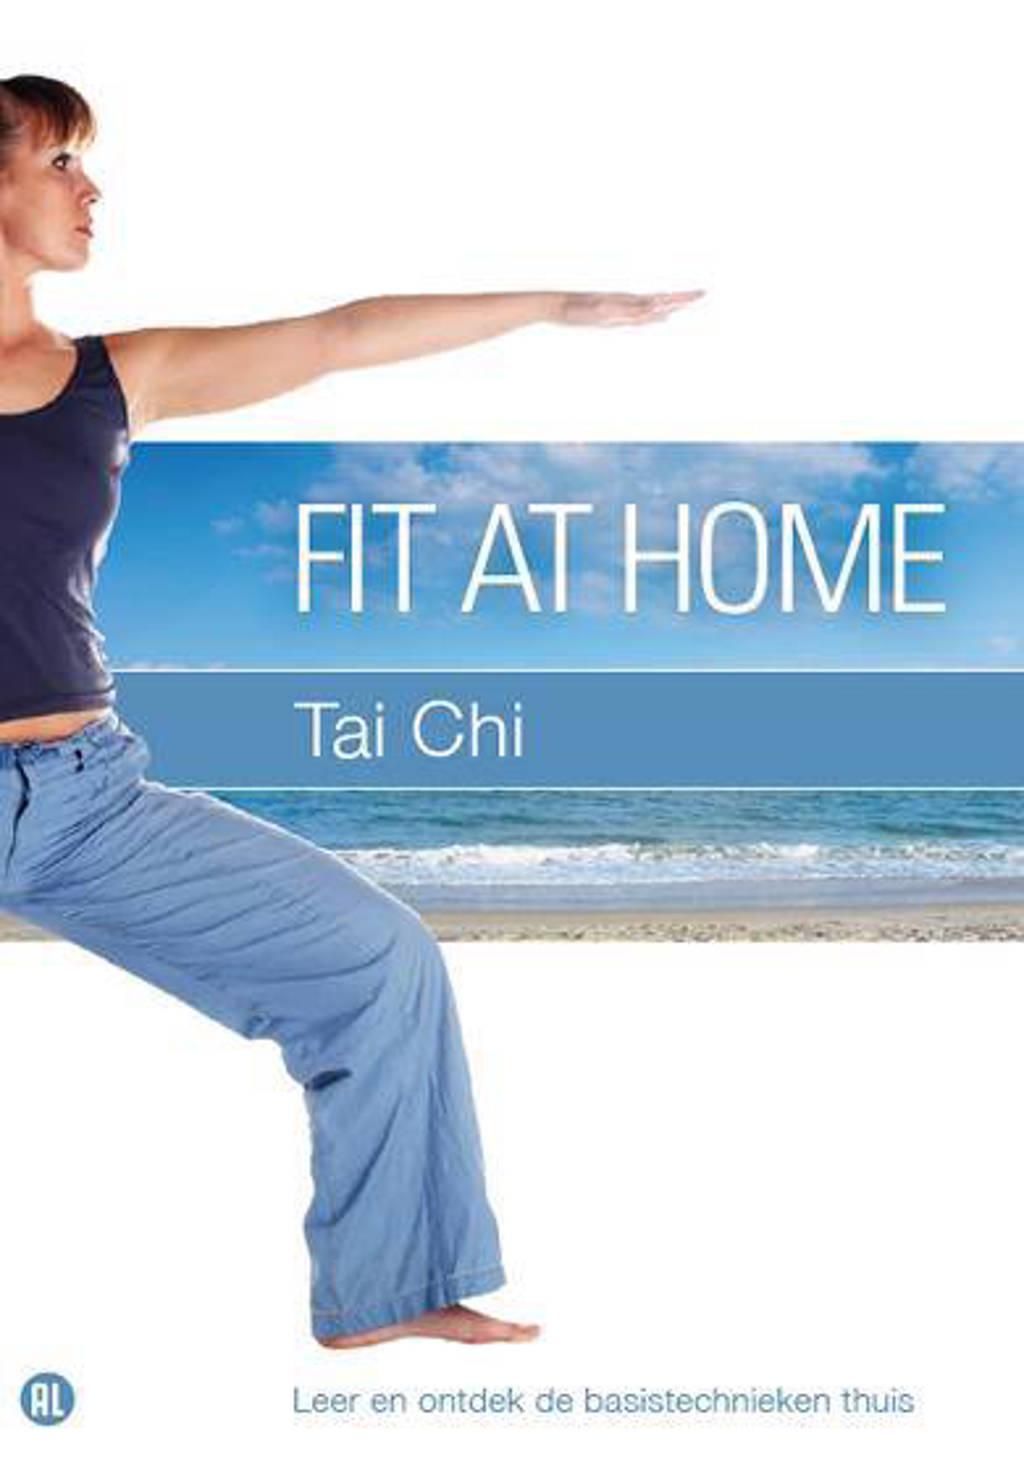 Fit at home - Tai Chi (DVD)